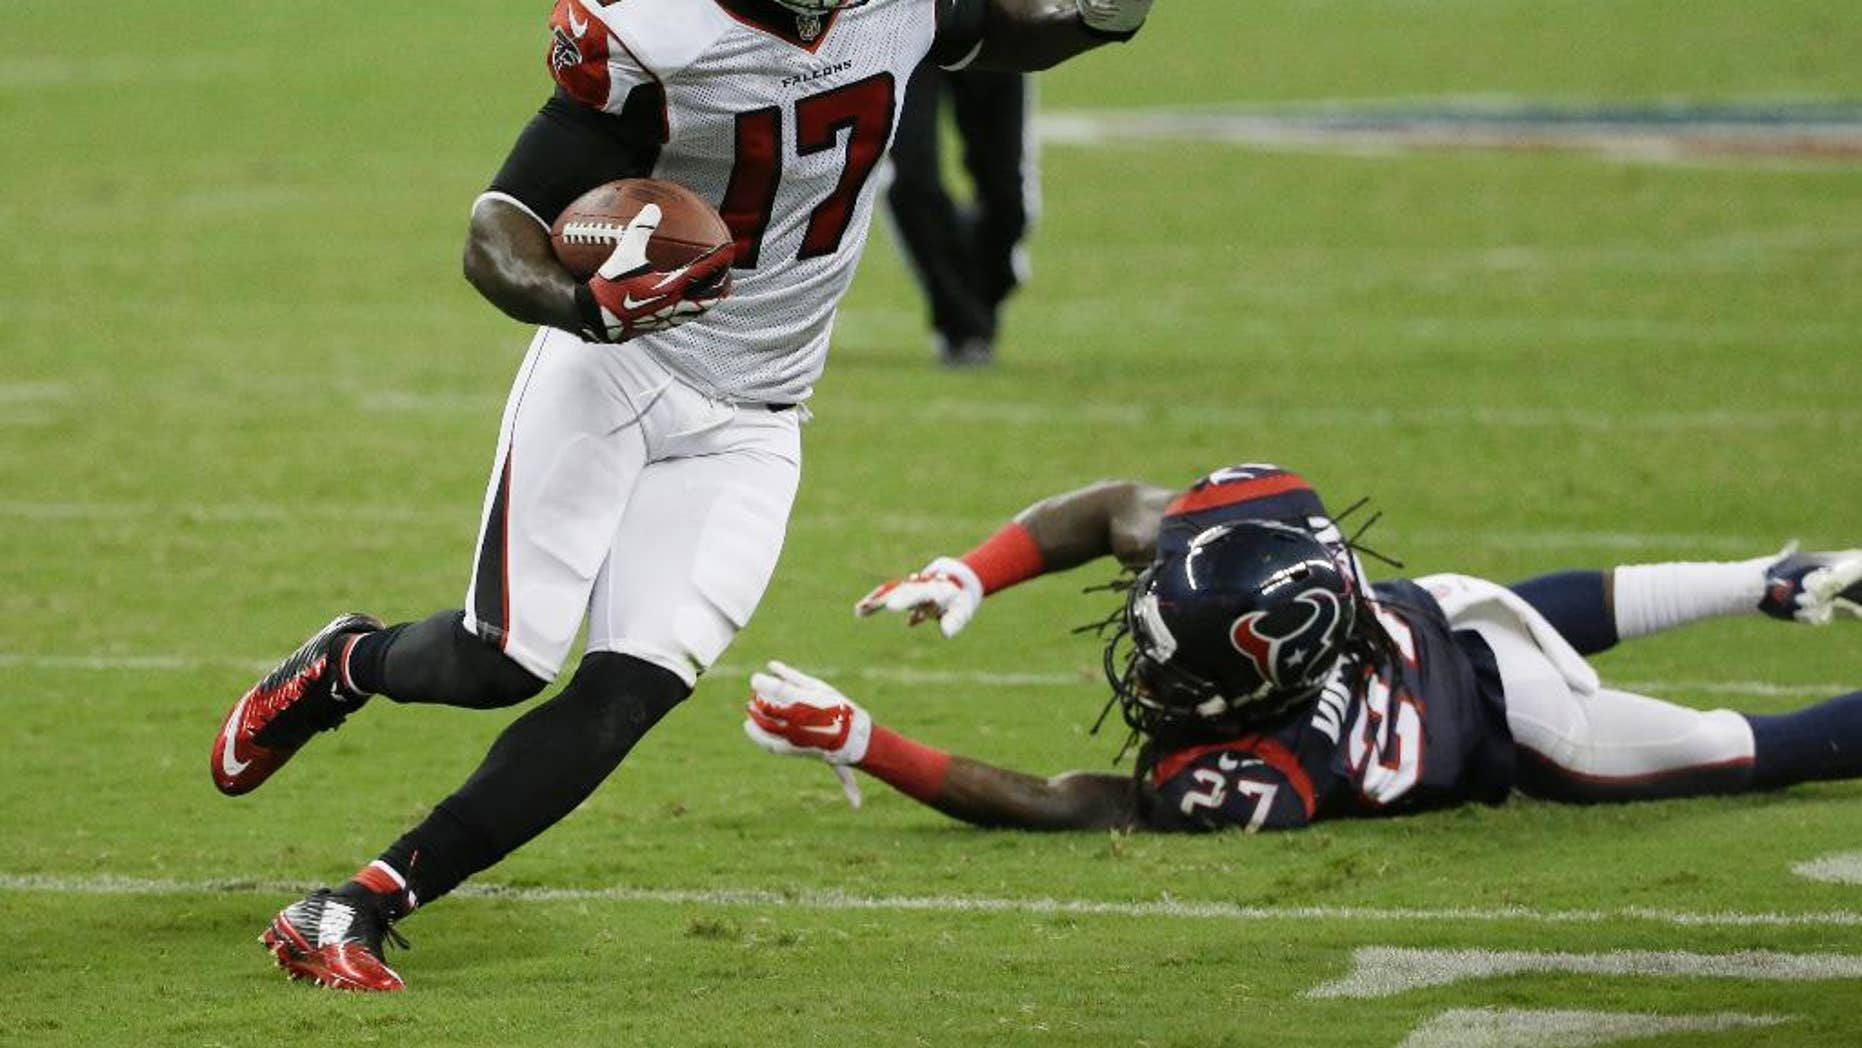 Atlanta Falcons' Devin Hester (17) evades Houston Texans' Josh Victorian (27) as he runs for a touchdown during the second quarter of an NFL preseason football game Saturday, Aug. 16, 2014, in Houston. (AP Photo/David J. Phillip)